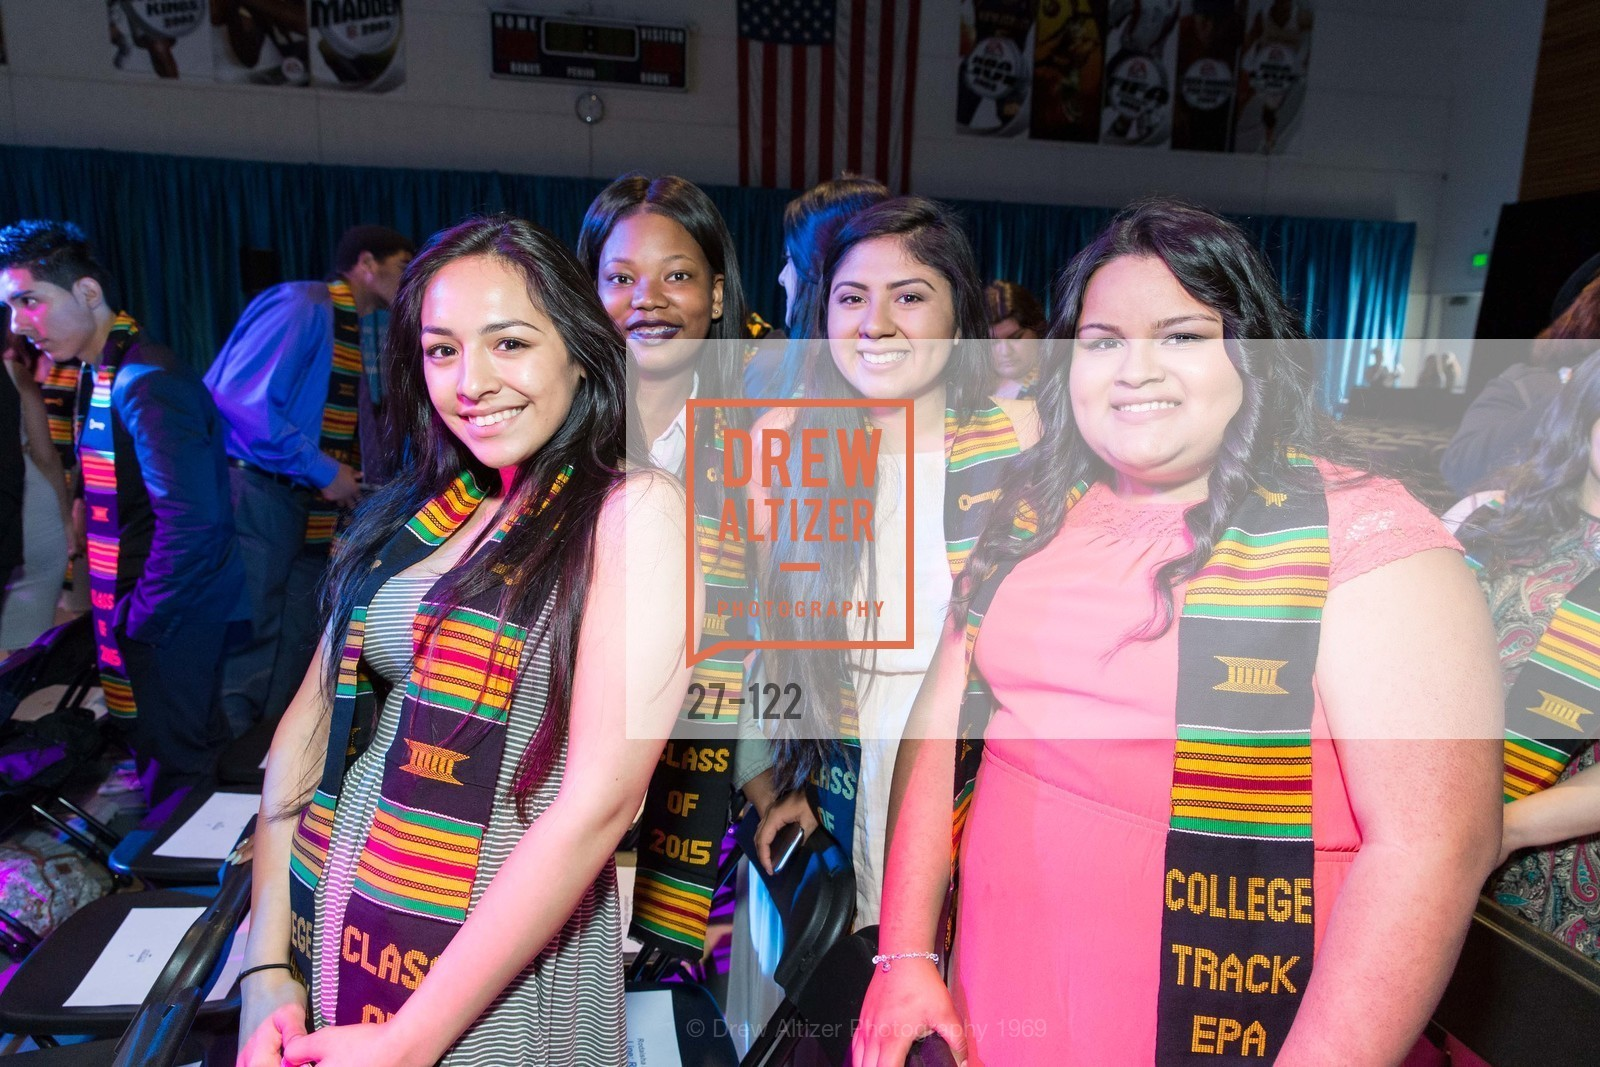 Extras, 2015 College Track